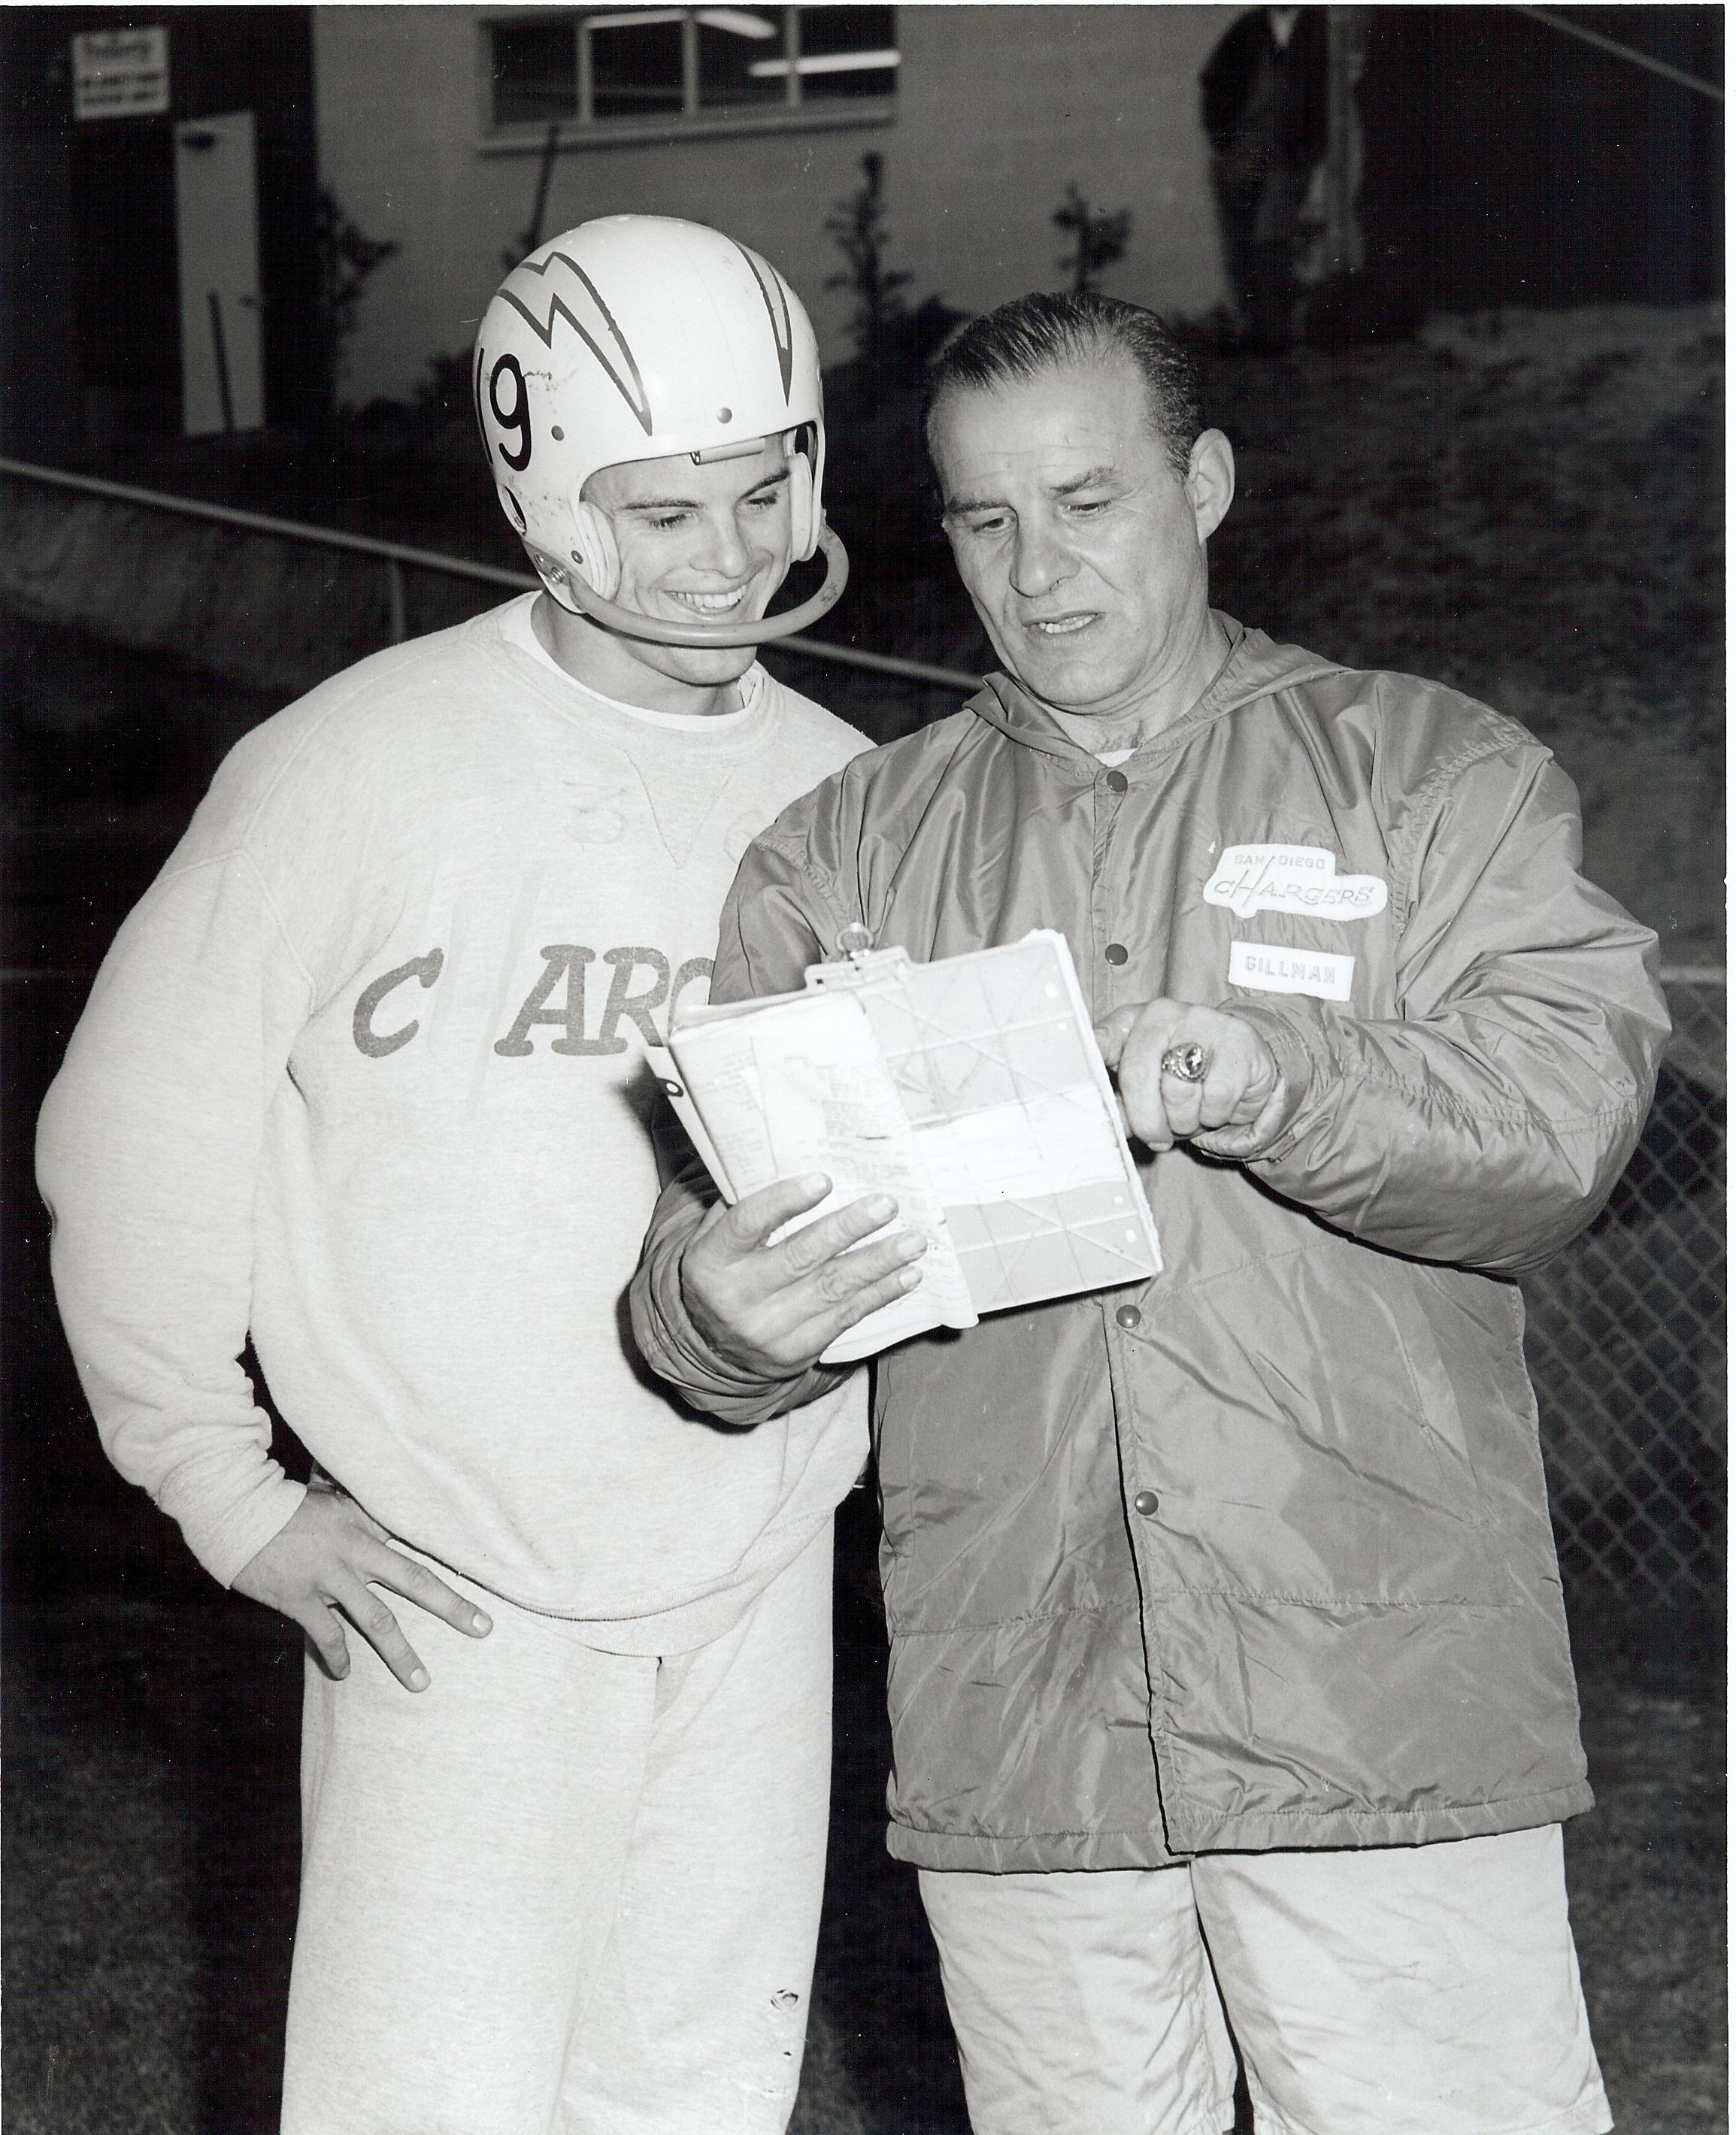 gillman and alworth